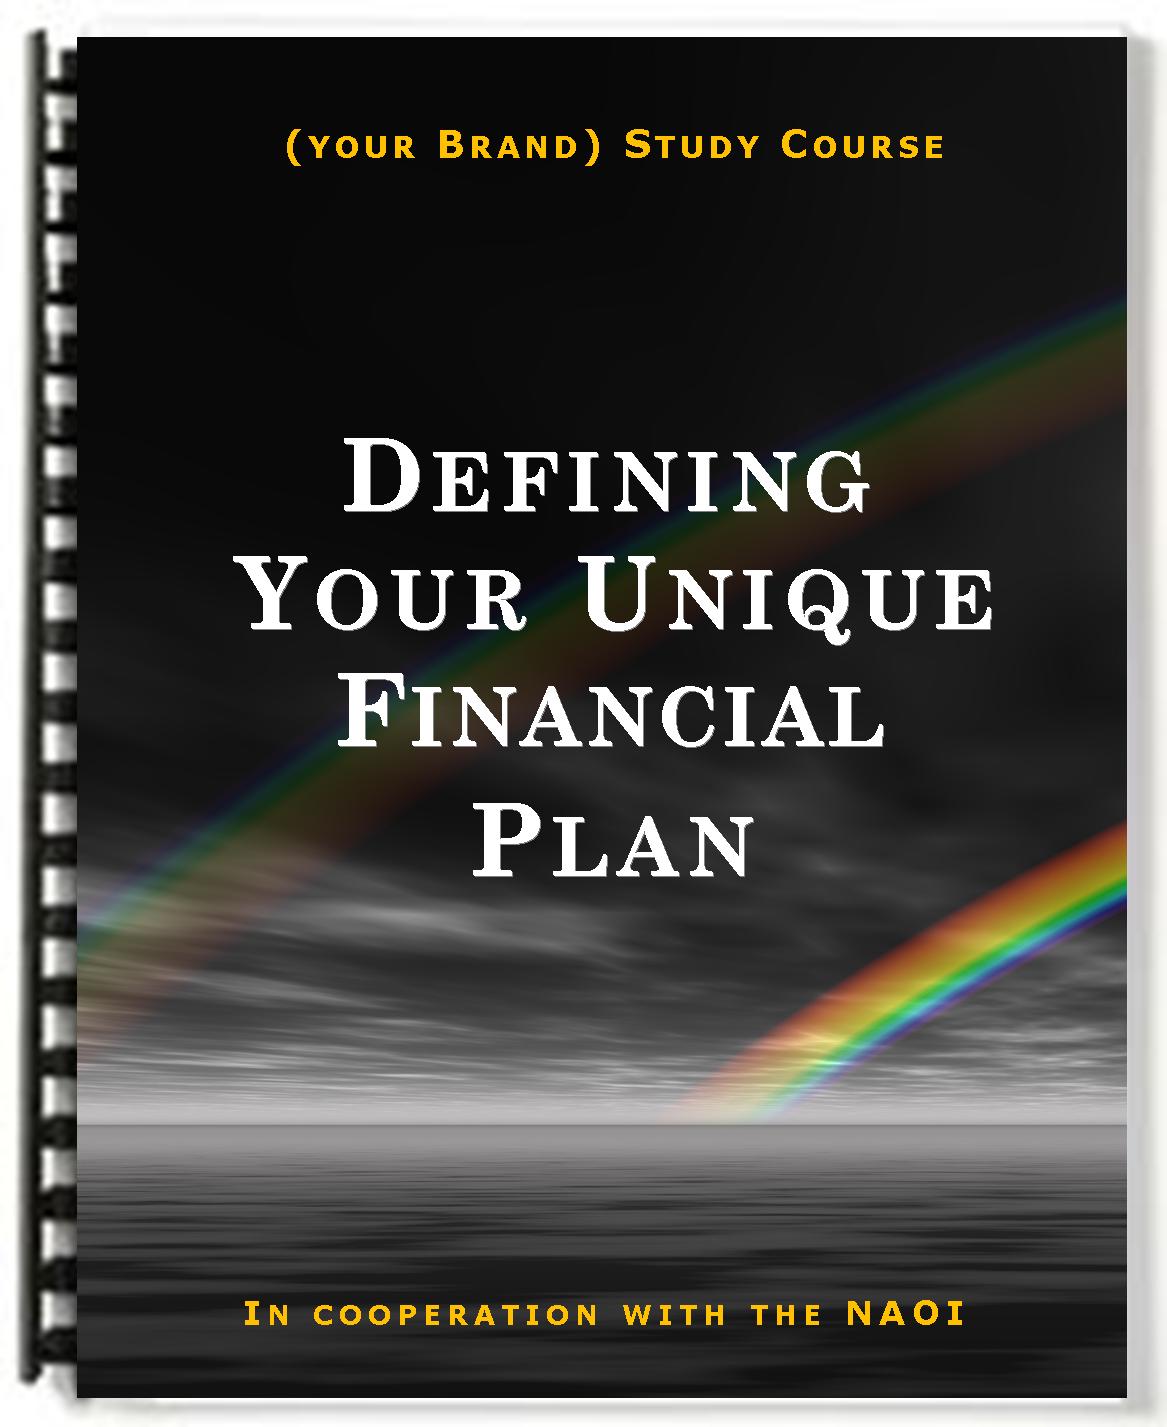 Financial Plan.png